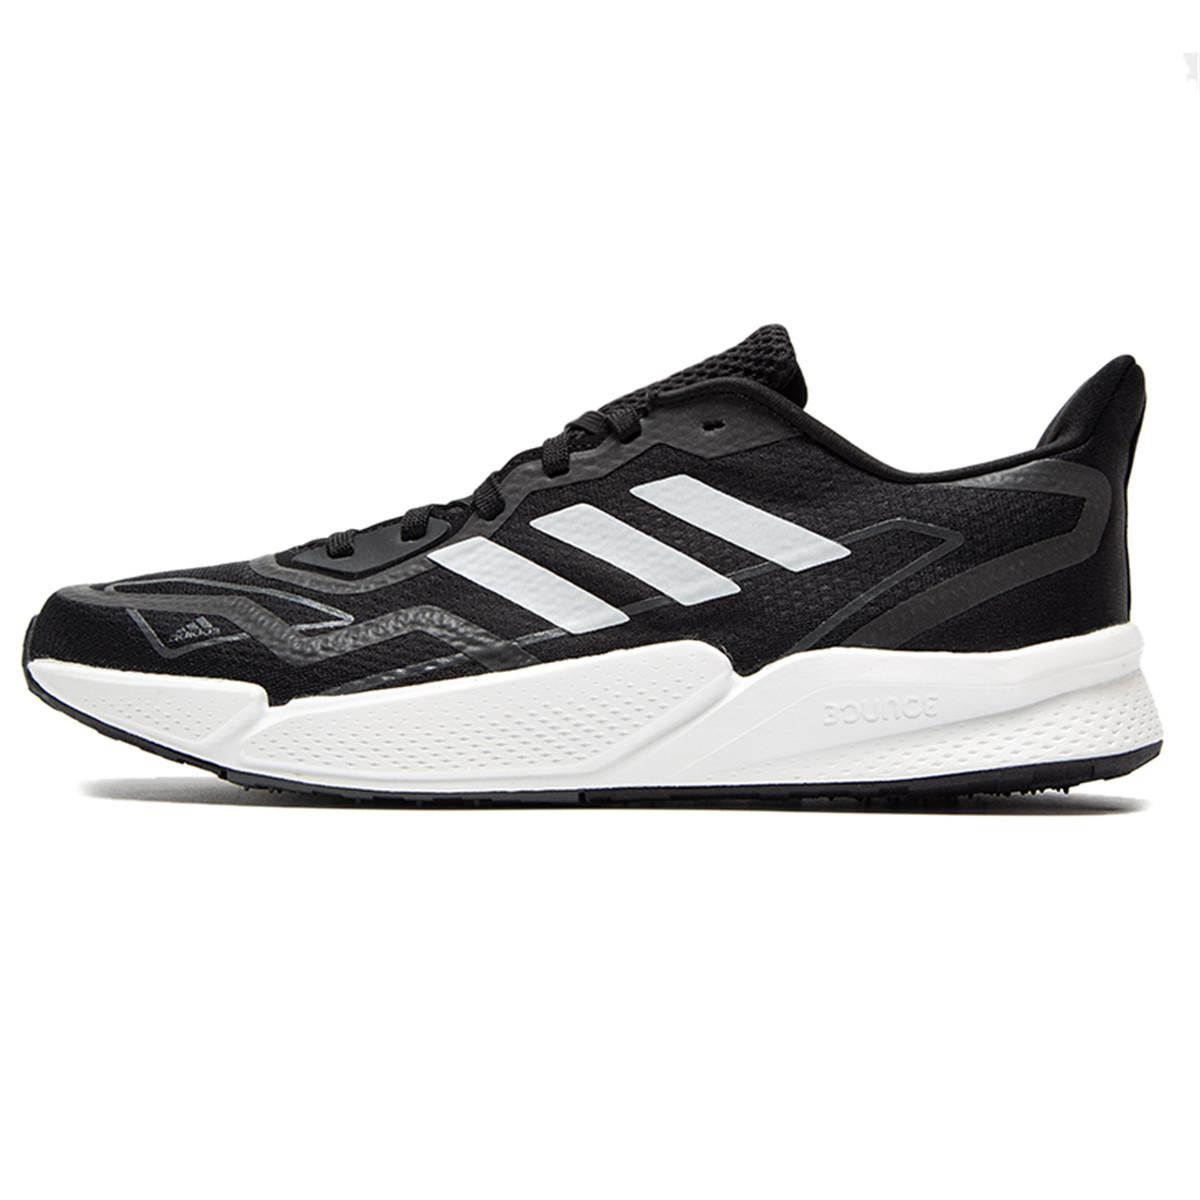 Adidas/阿迪达斯男子低帮休闲跑步运动鞋FX8384